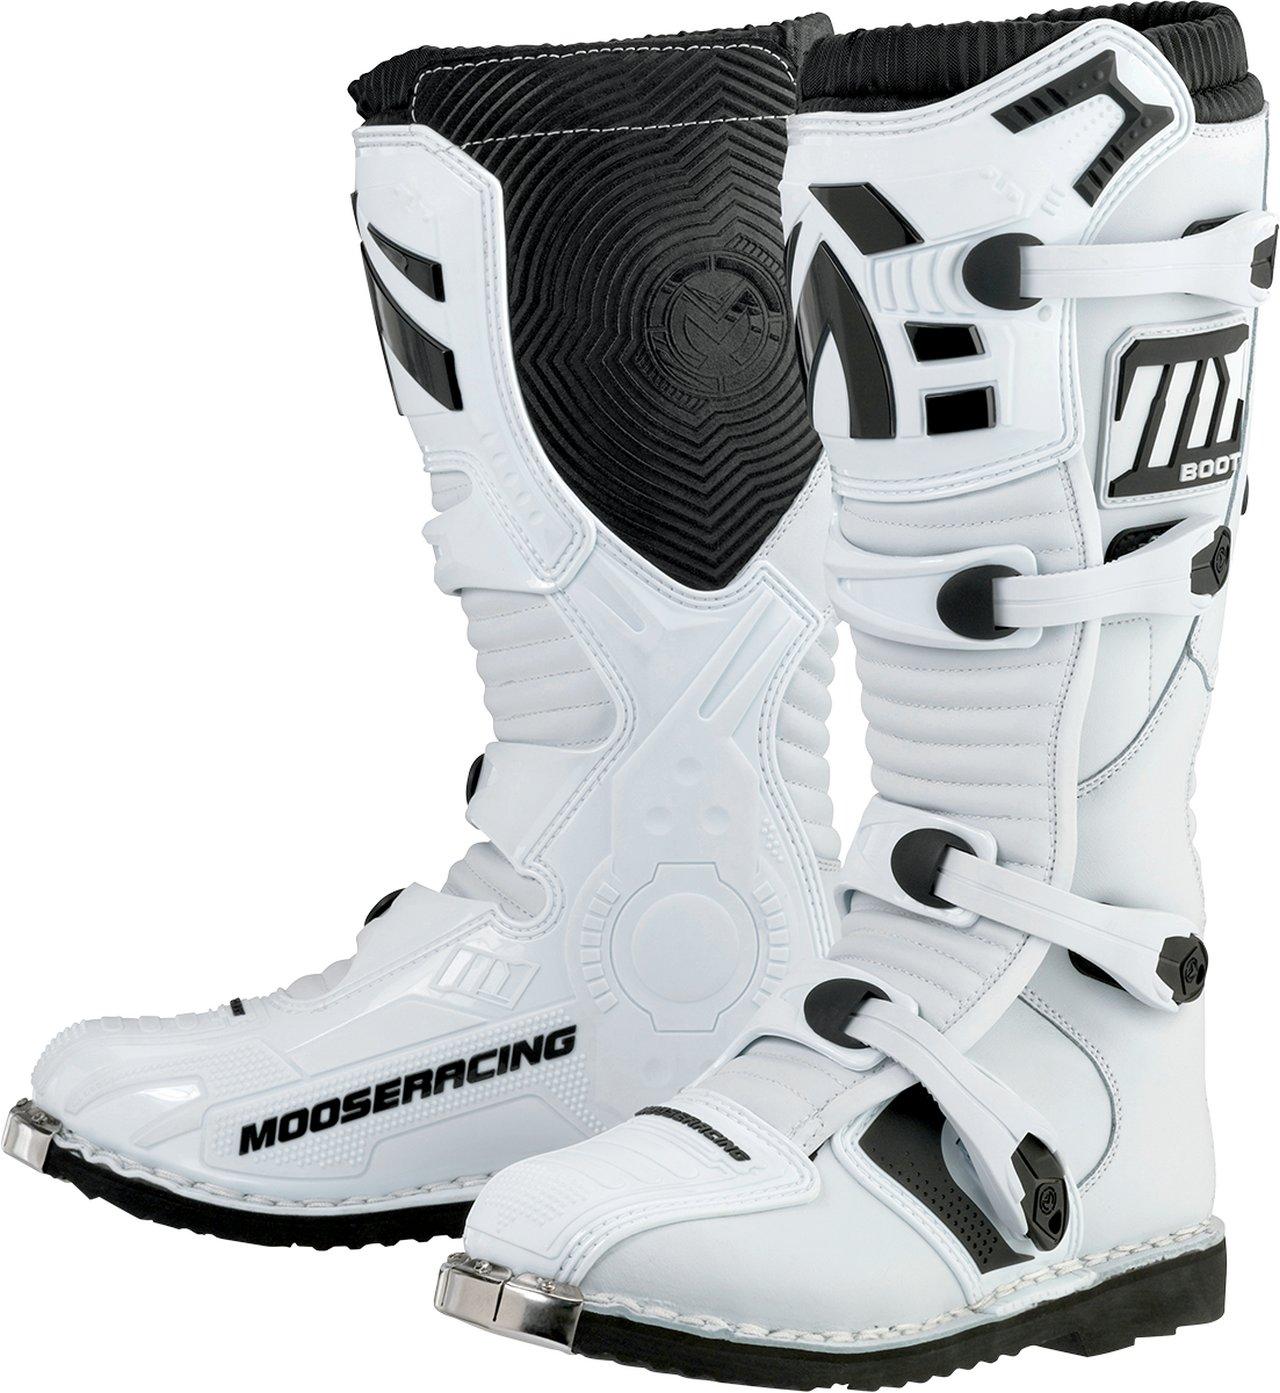 【MOOSE RACING】M1.2 越野車靴 [3410-0898] - 「Webike-摩托百貨」